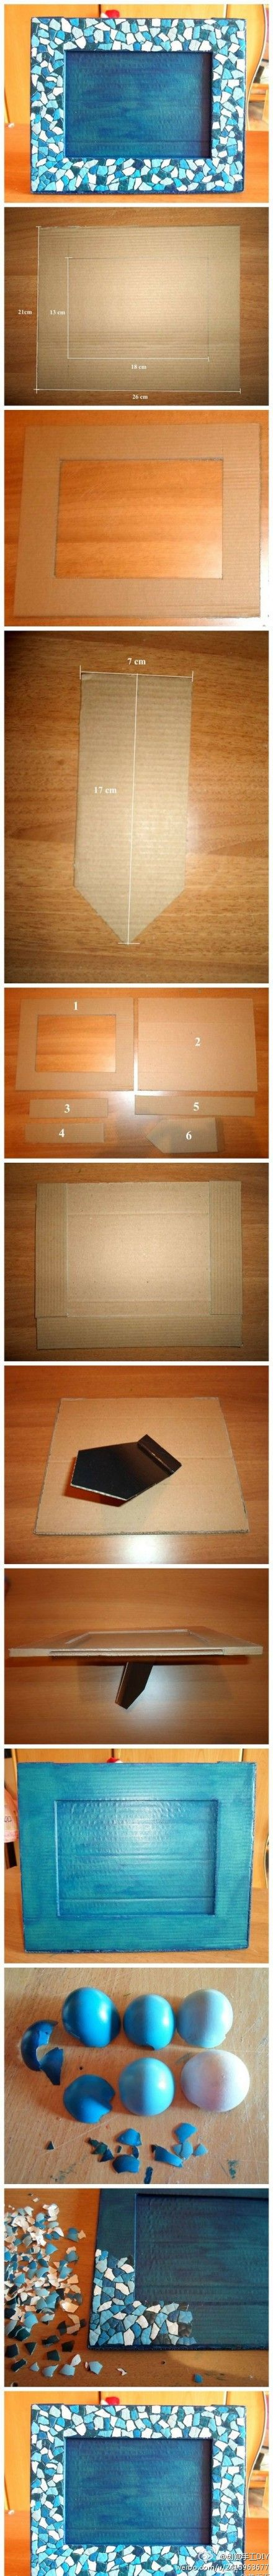 DIY Cardboard/Eggshell Mosaic Picture Frame